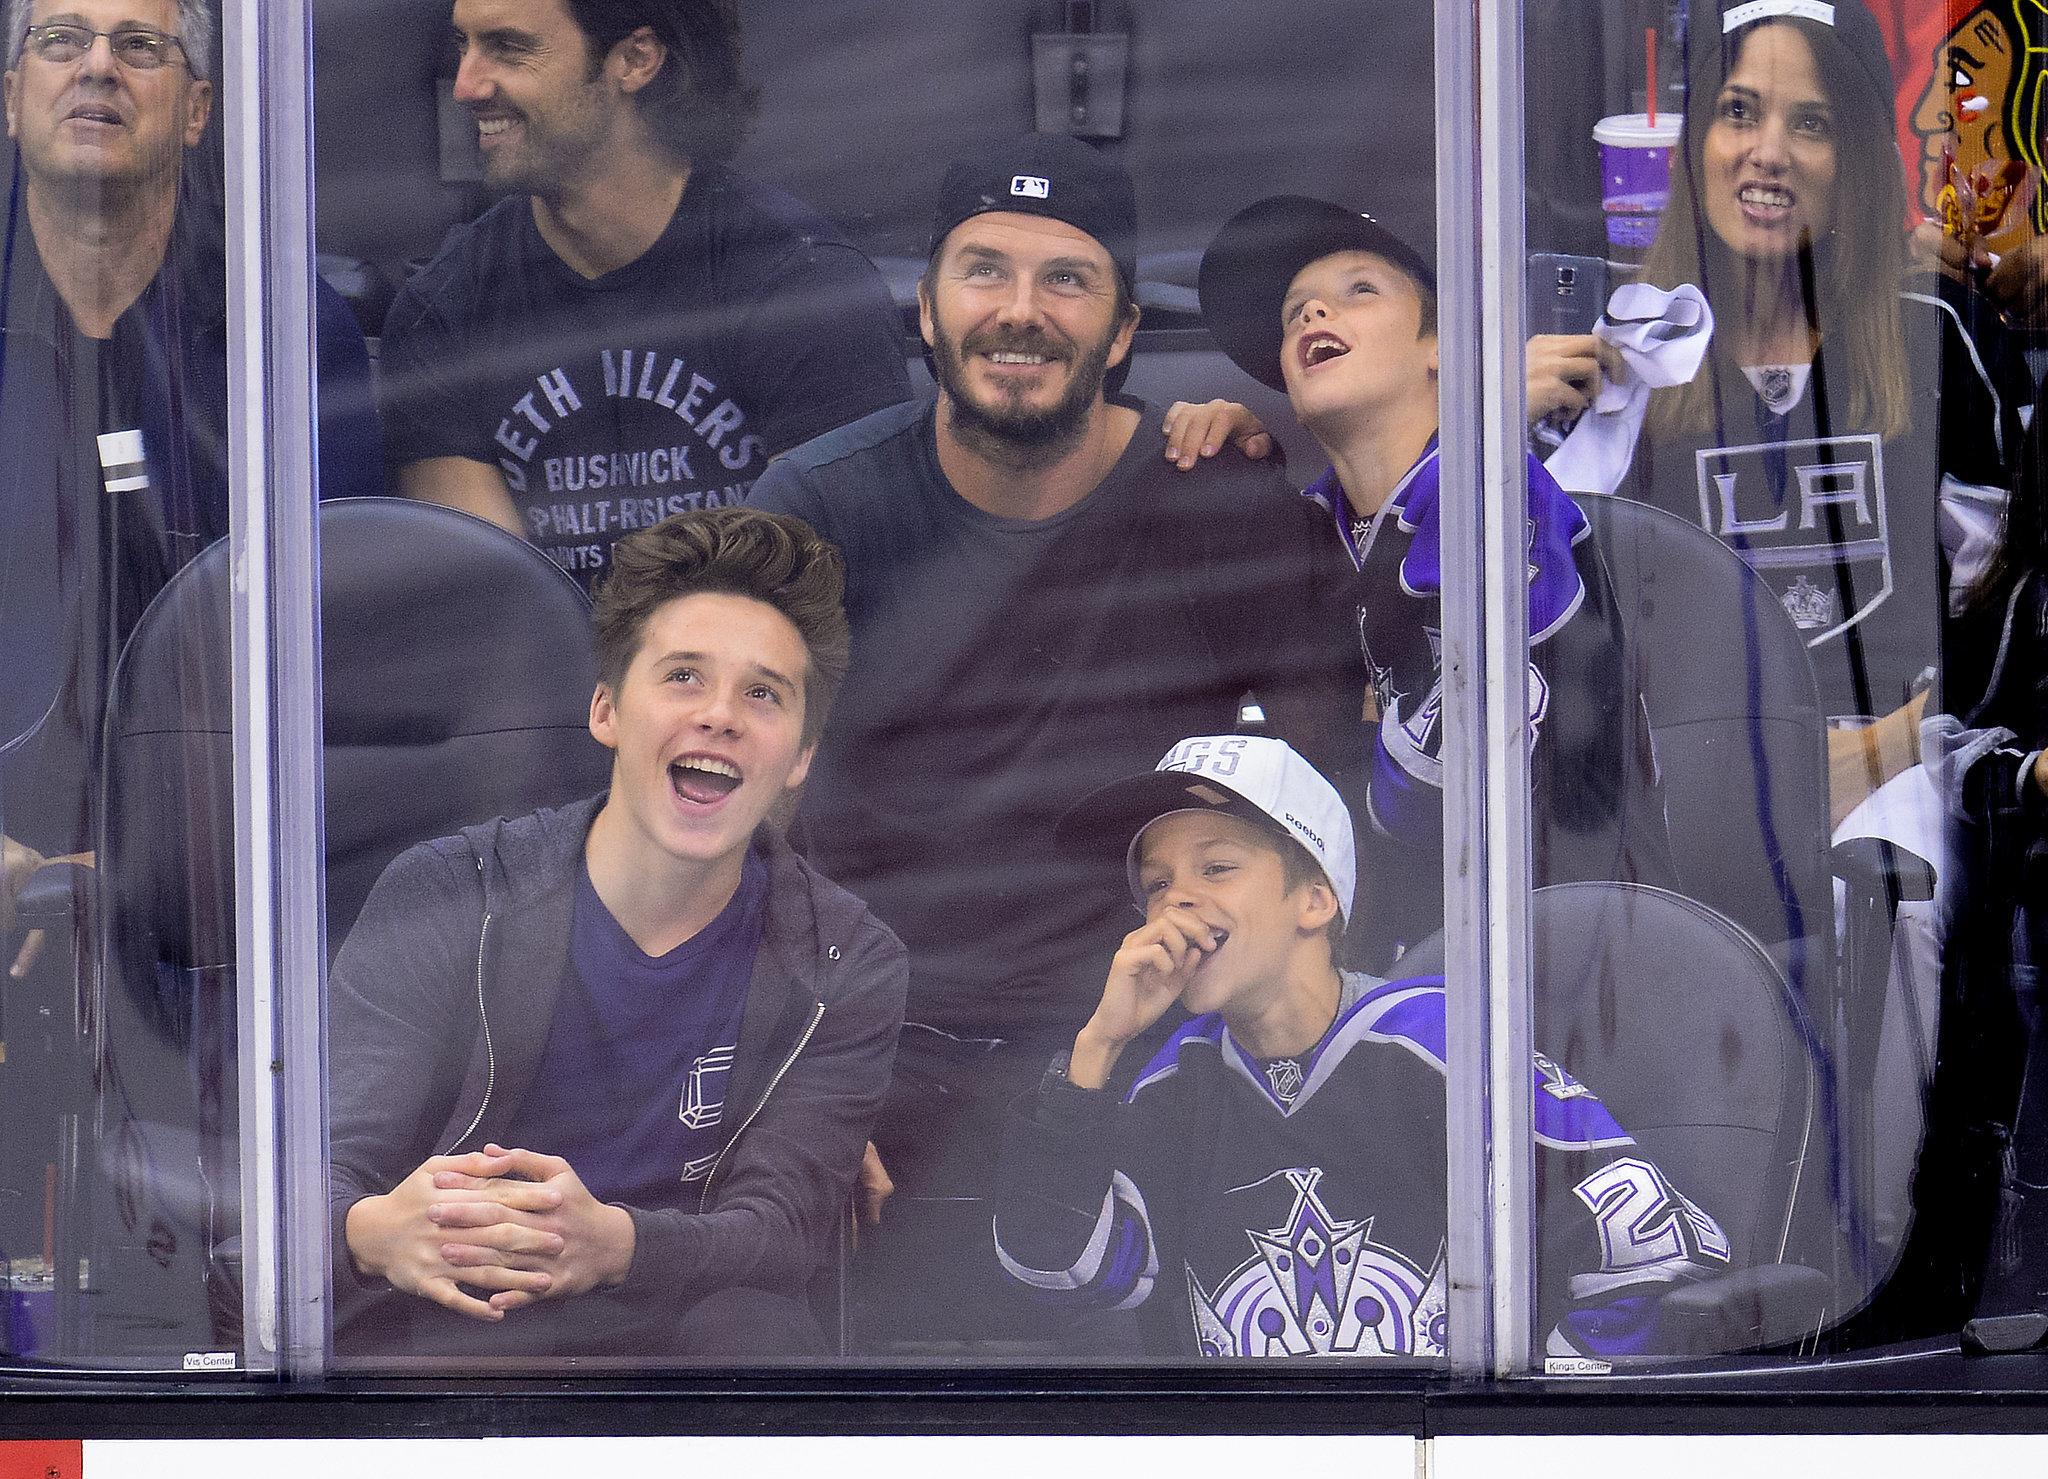 David Beckham brought his boys — Brooklyn, Romeo, and Cruz — to the LA Kings hockey game on Saturday.